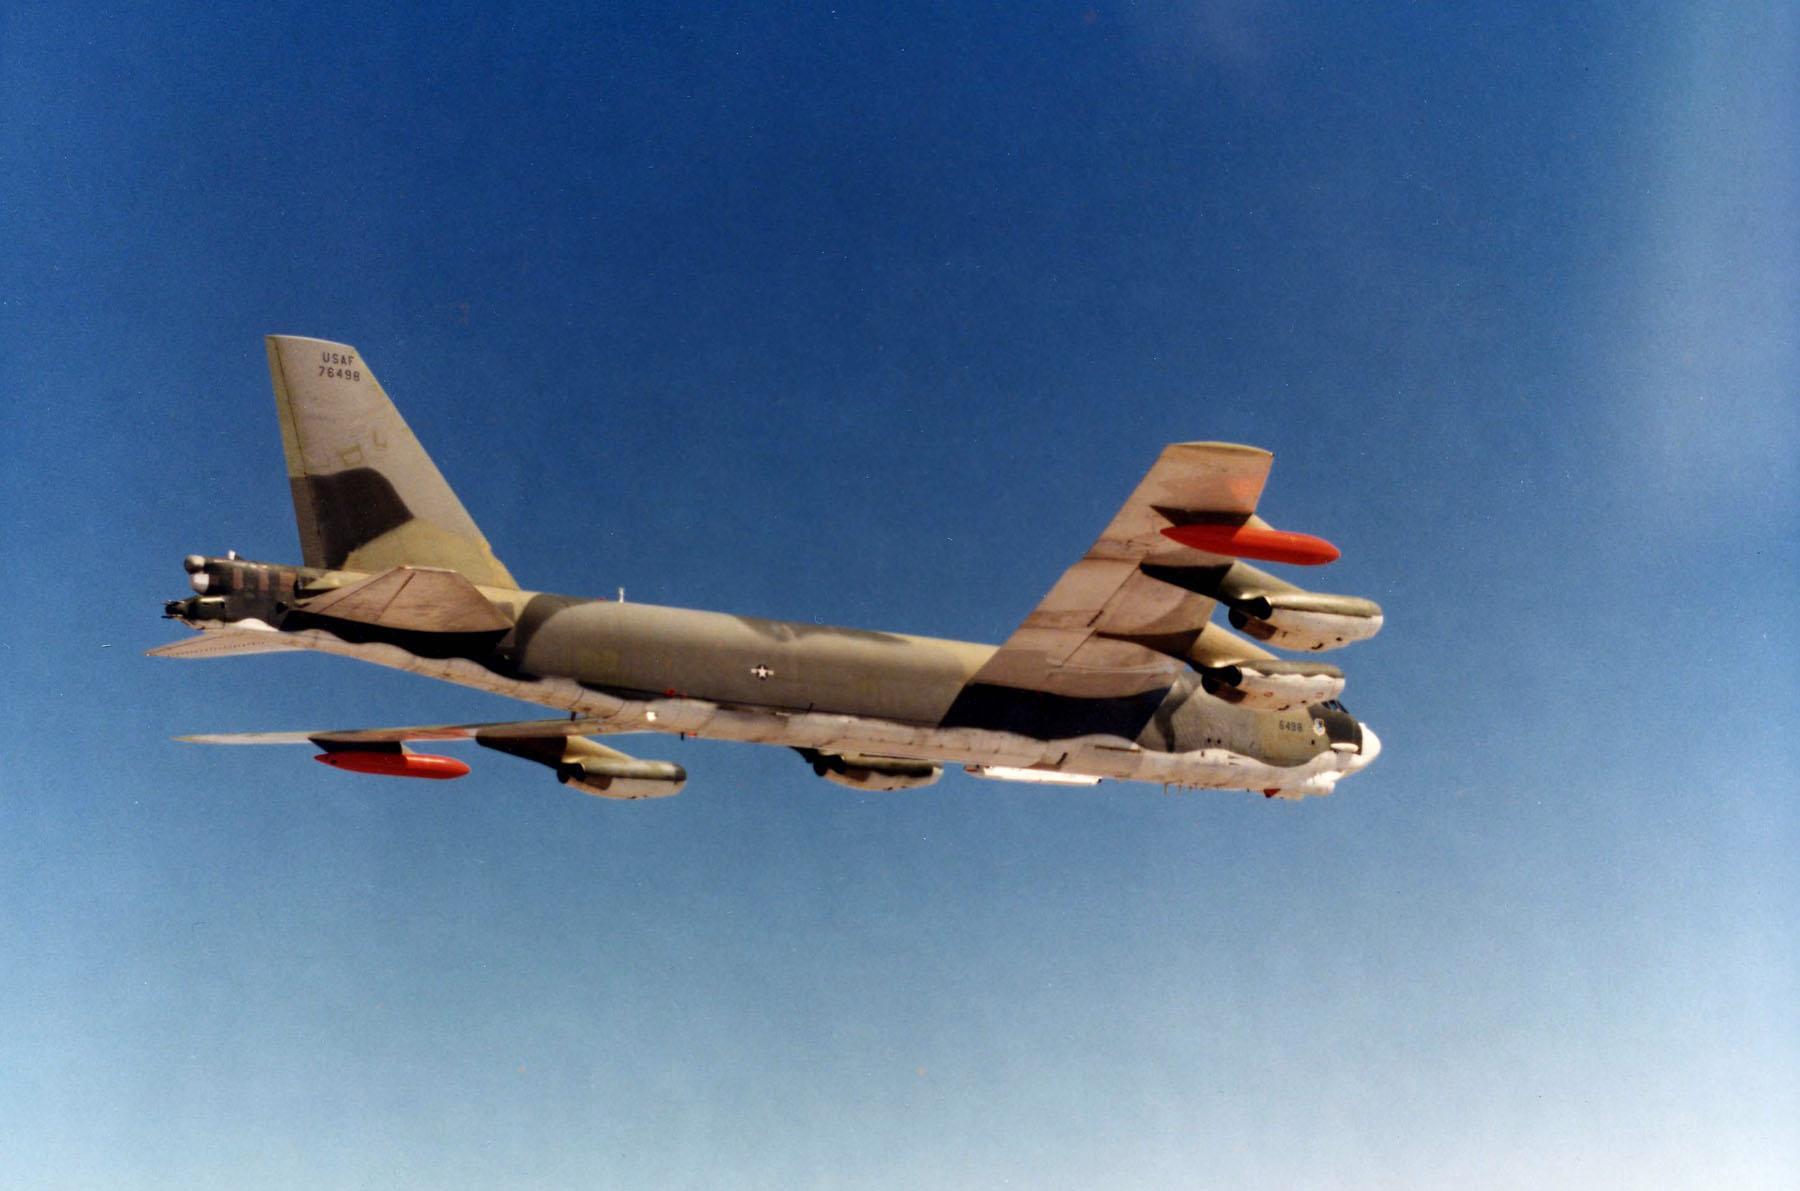 1968 Thule Air Base B 52 Crash Wikipedia Fusion 700 Marine Stereo Wiring Diagram